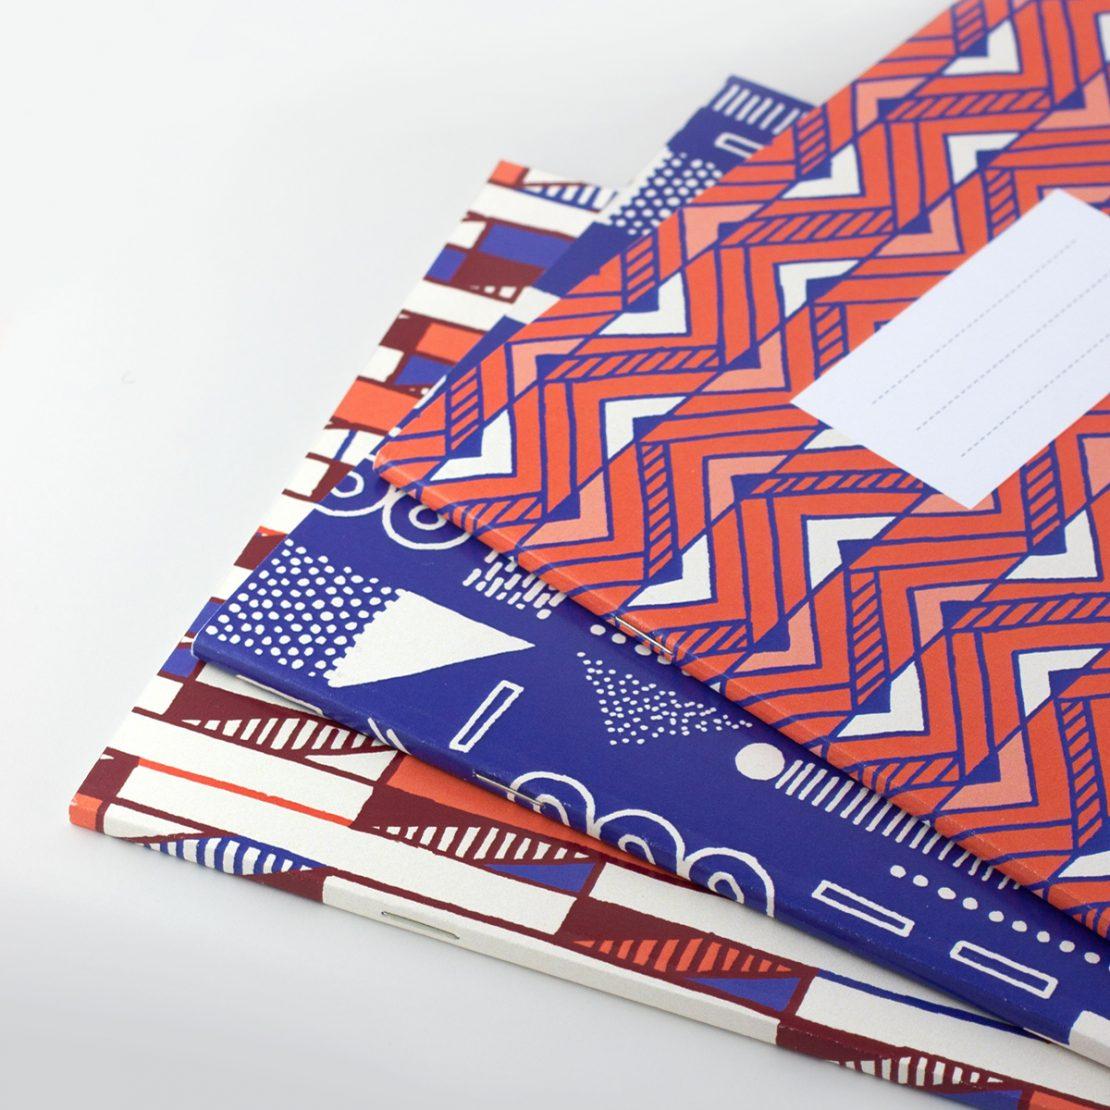 Annalisa Papagna shop - Sophie notebook set detail